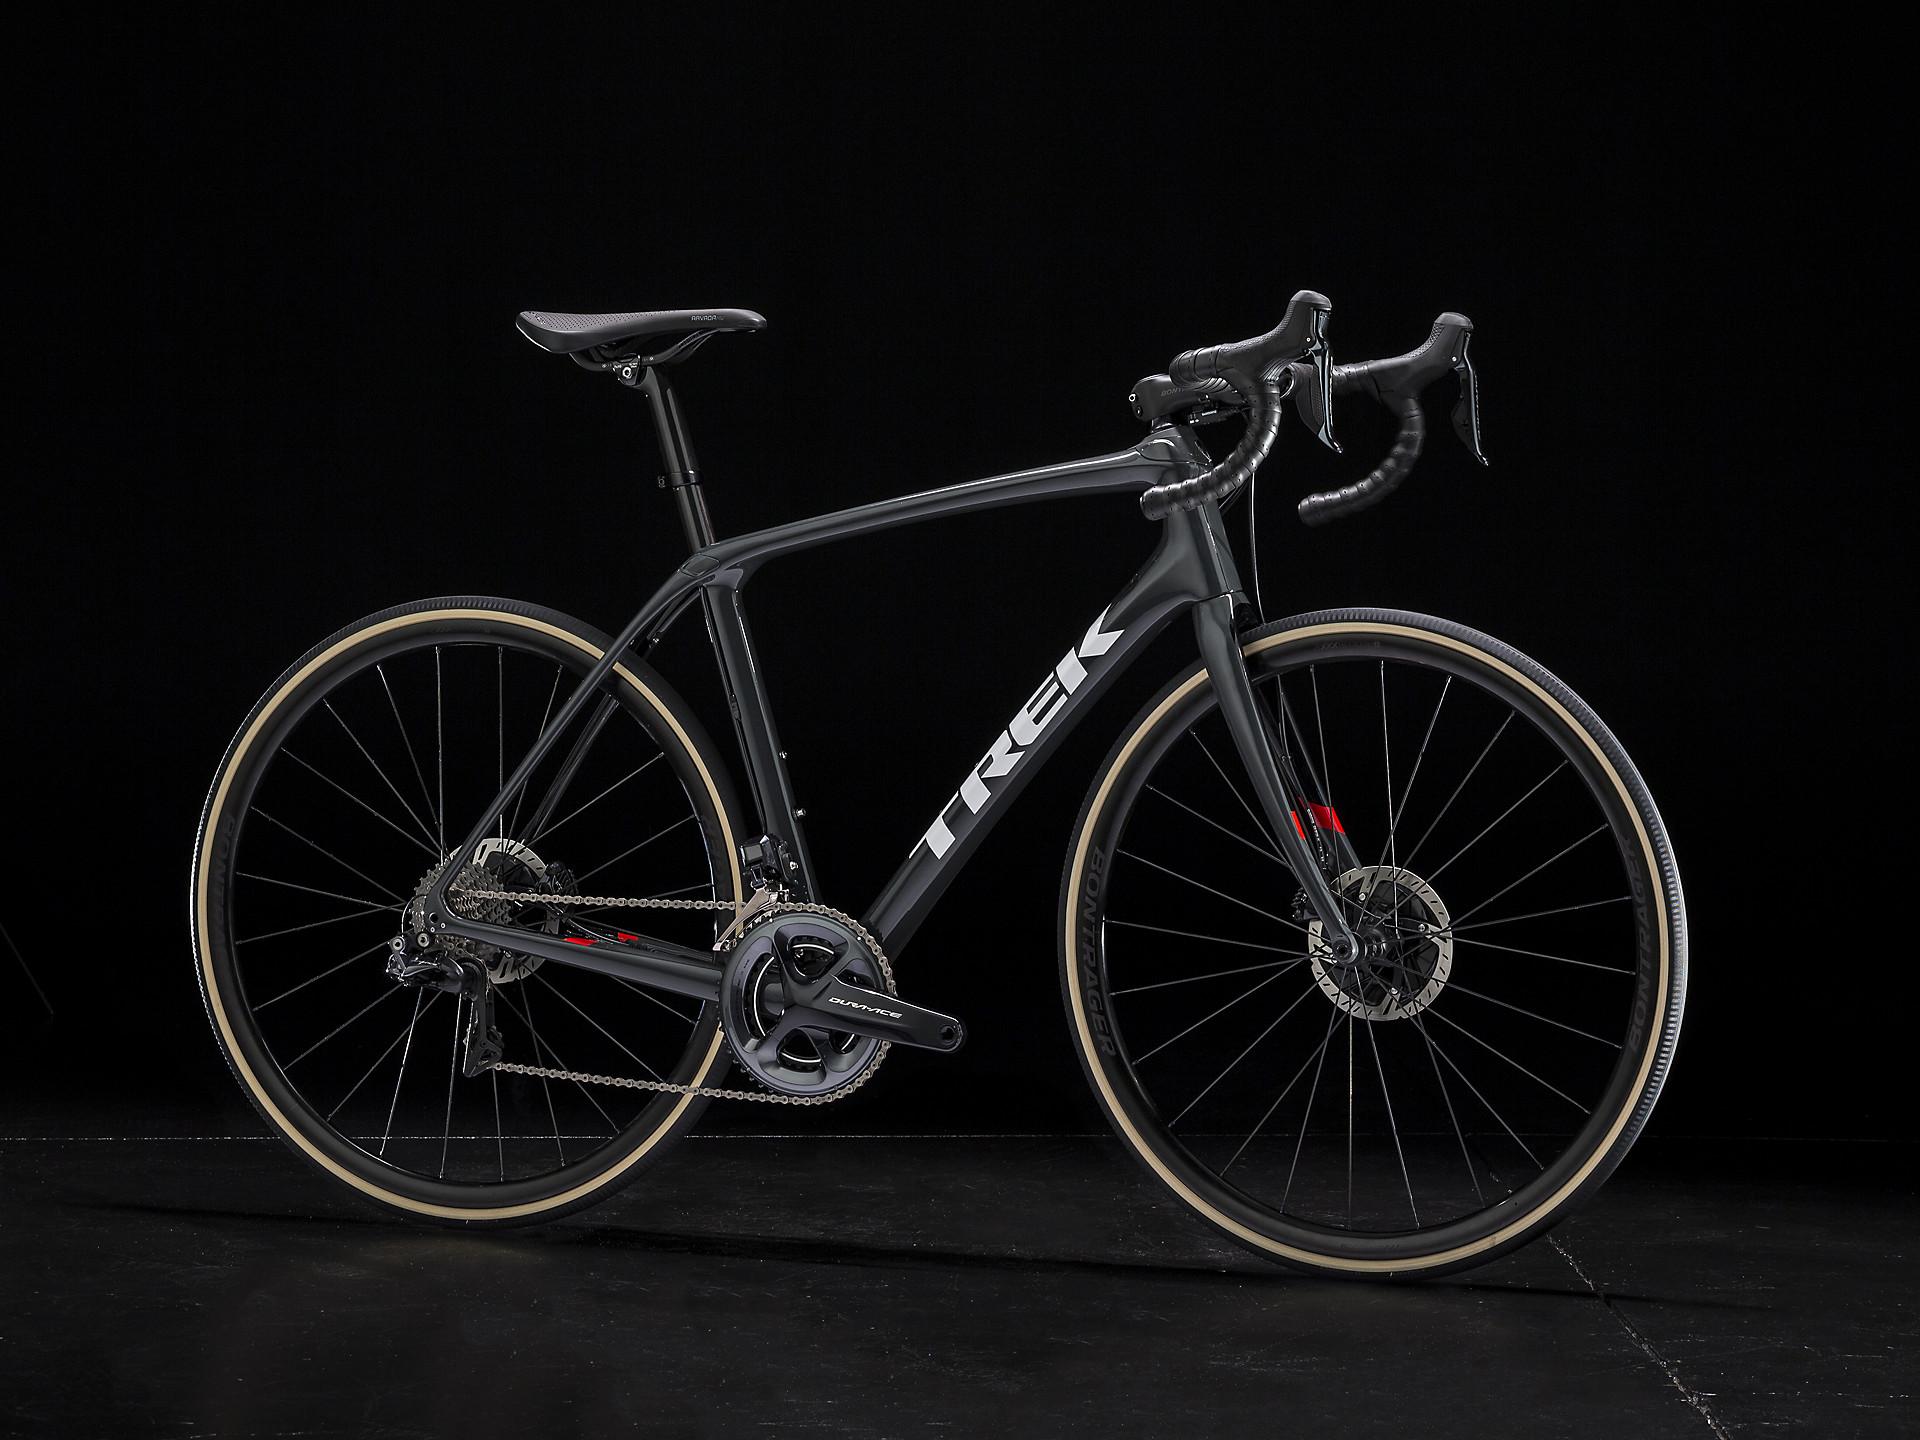 e44bba1d01f Domane SLR 9 Disc | Trek Bikes